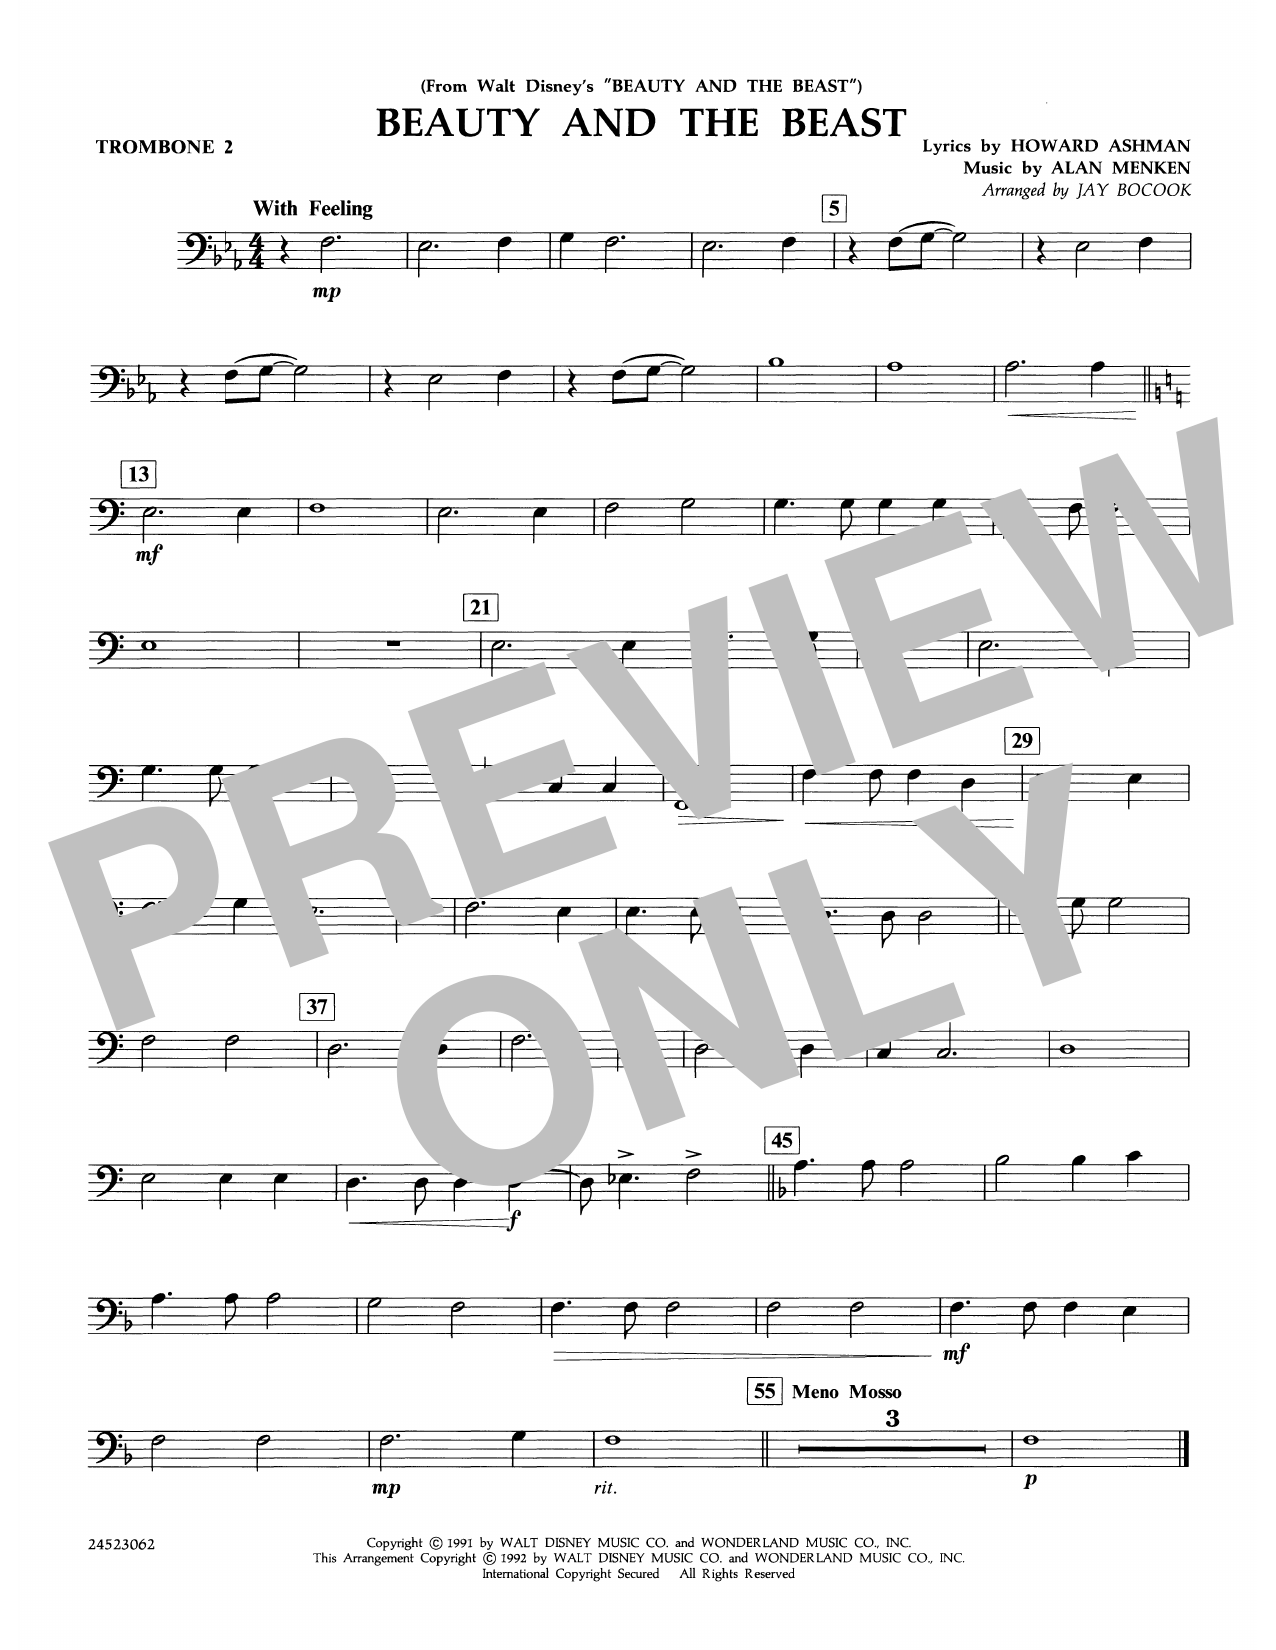 Beauty and the Beast - Trombone 2 Sheet Music